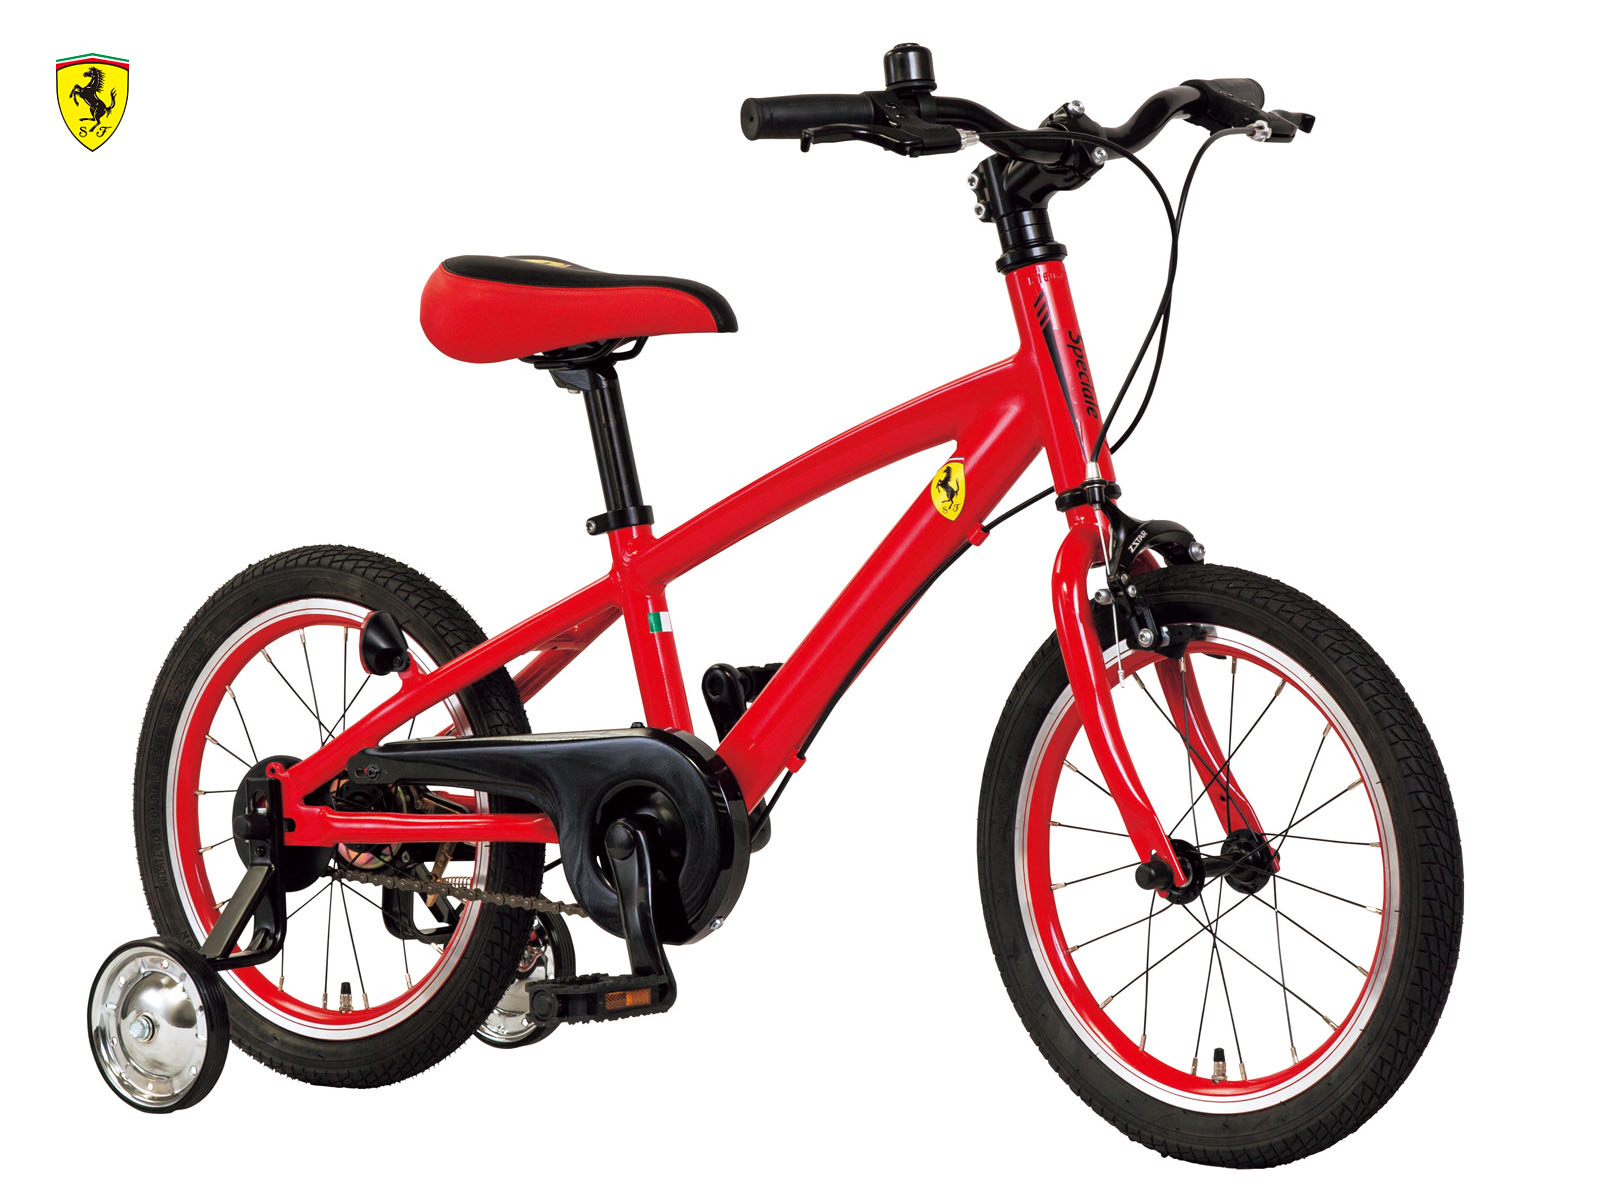 [ALTA Class]軽量アルミフレーム・プレミアムキッズバイク 16inch モノコック風フレーム、軽量9.3kg、高級キッズバイク